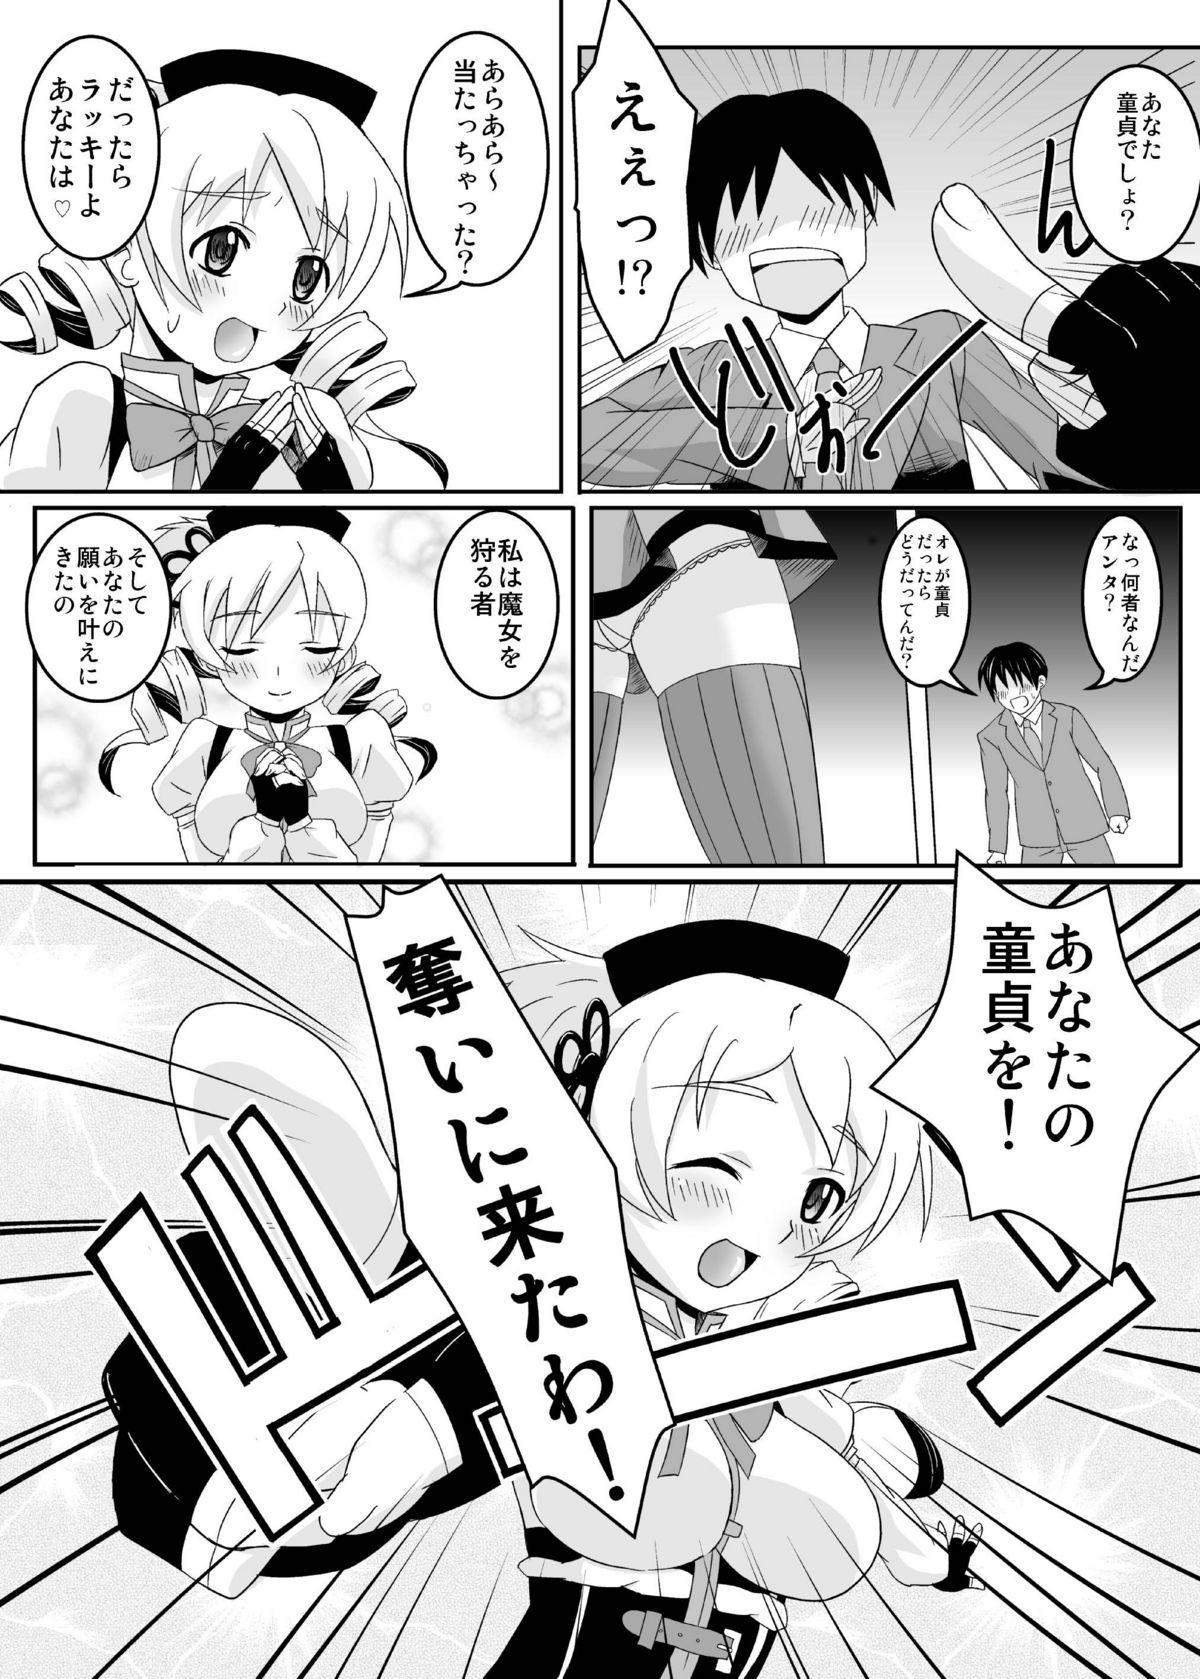 Osewani narimasu Mami-san! 4